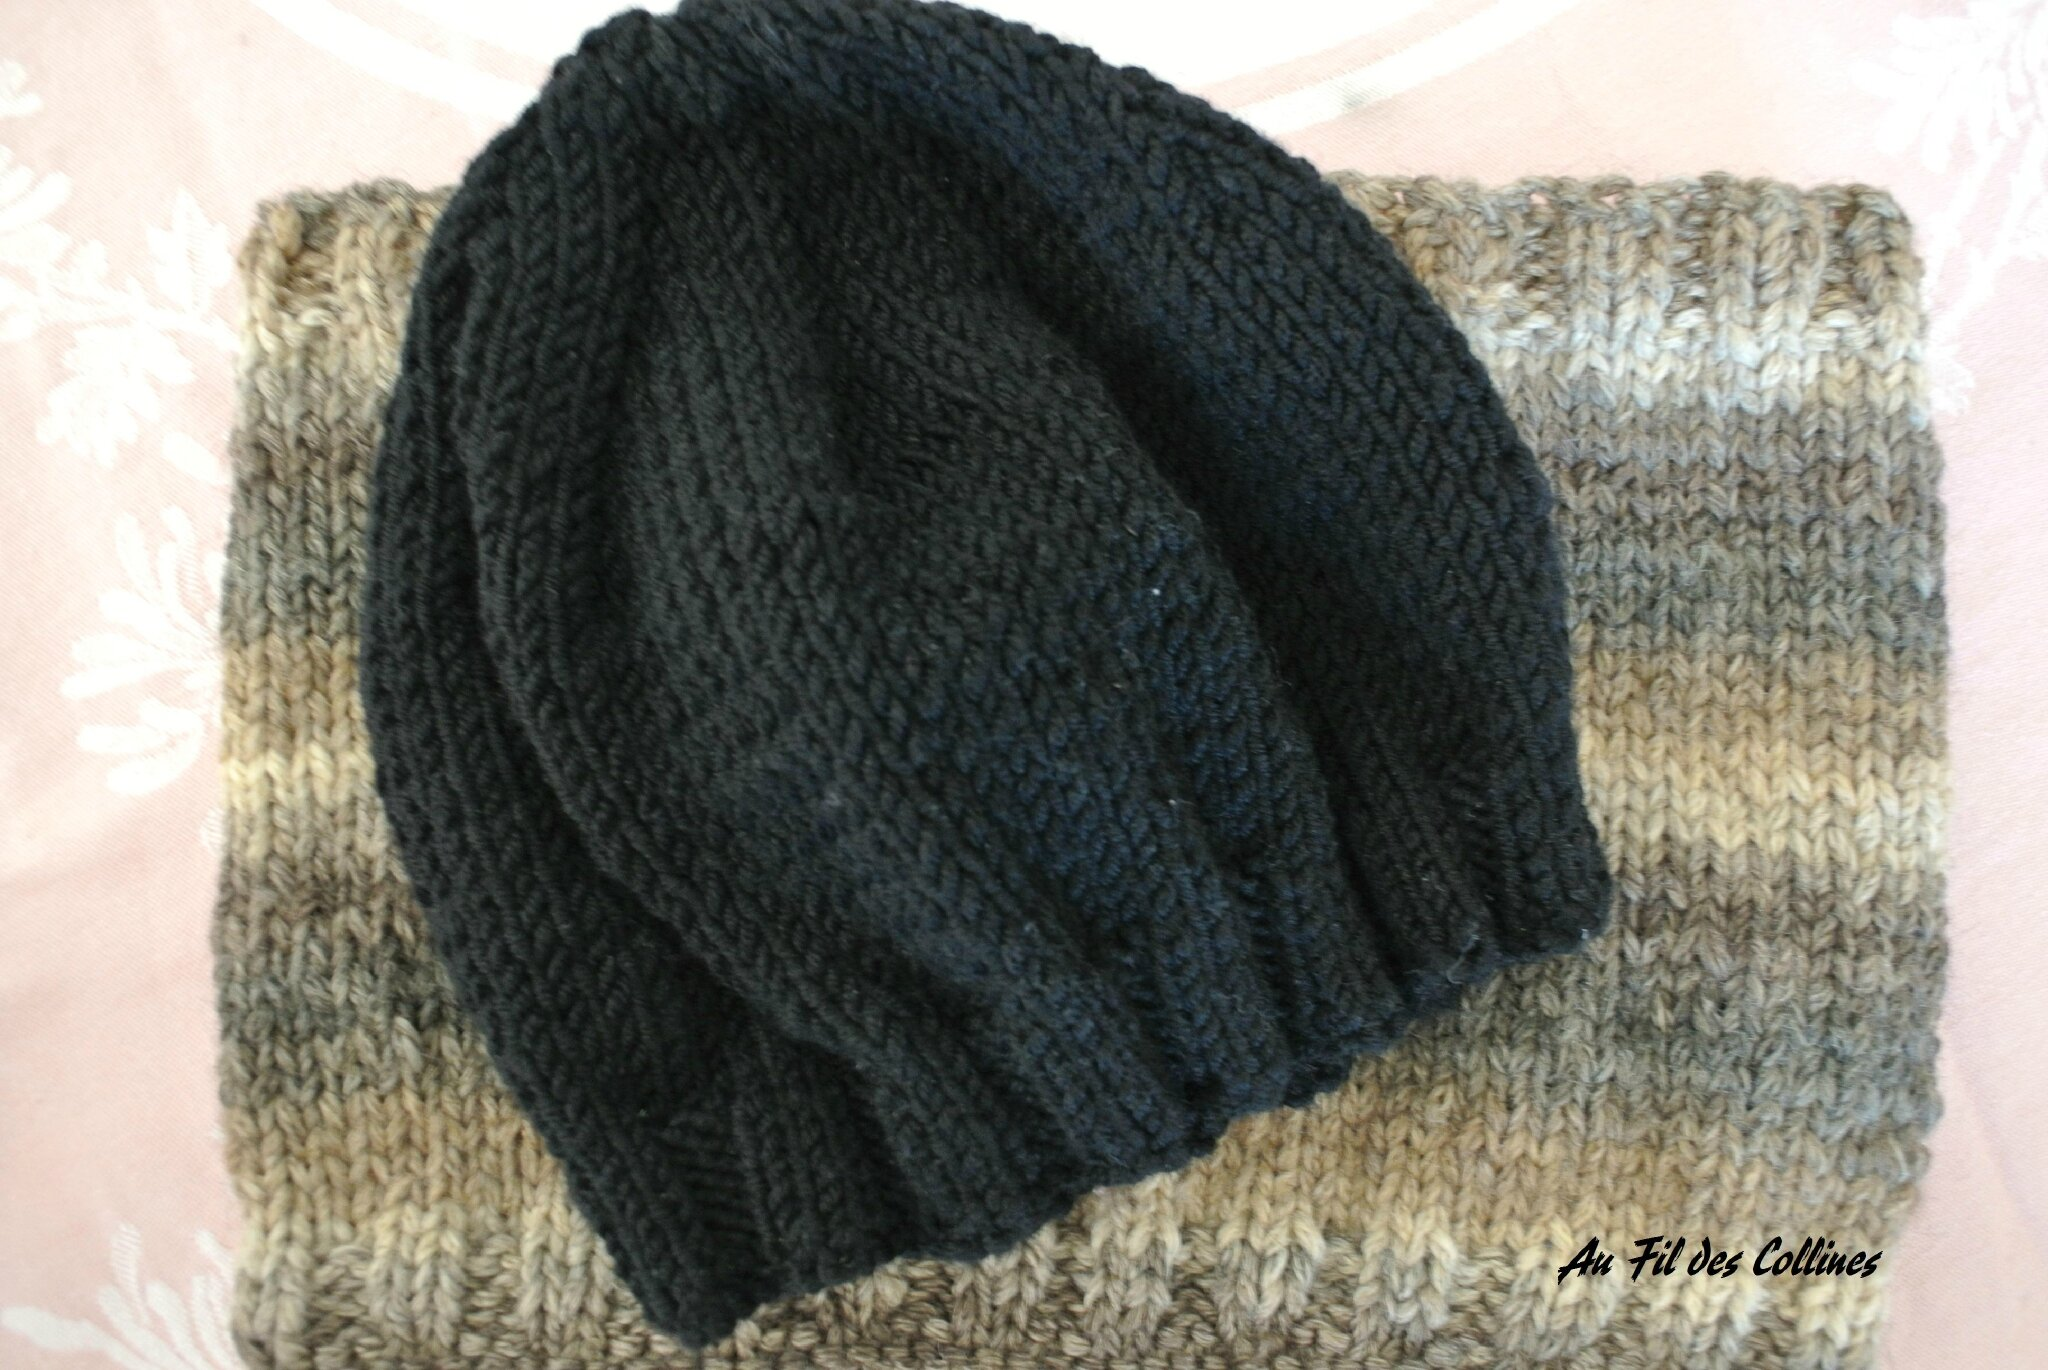 126ccb1767df Tuto tricot bonnet bonnet laine made in france   Arts4a